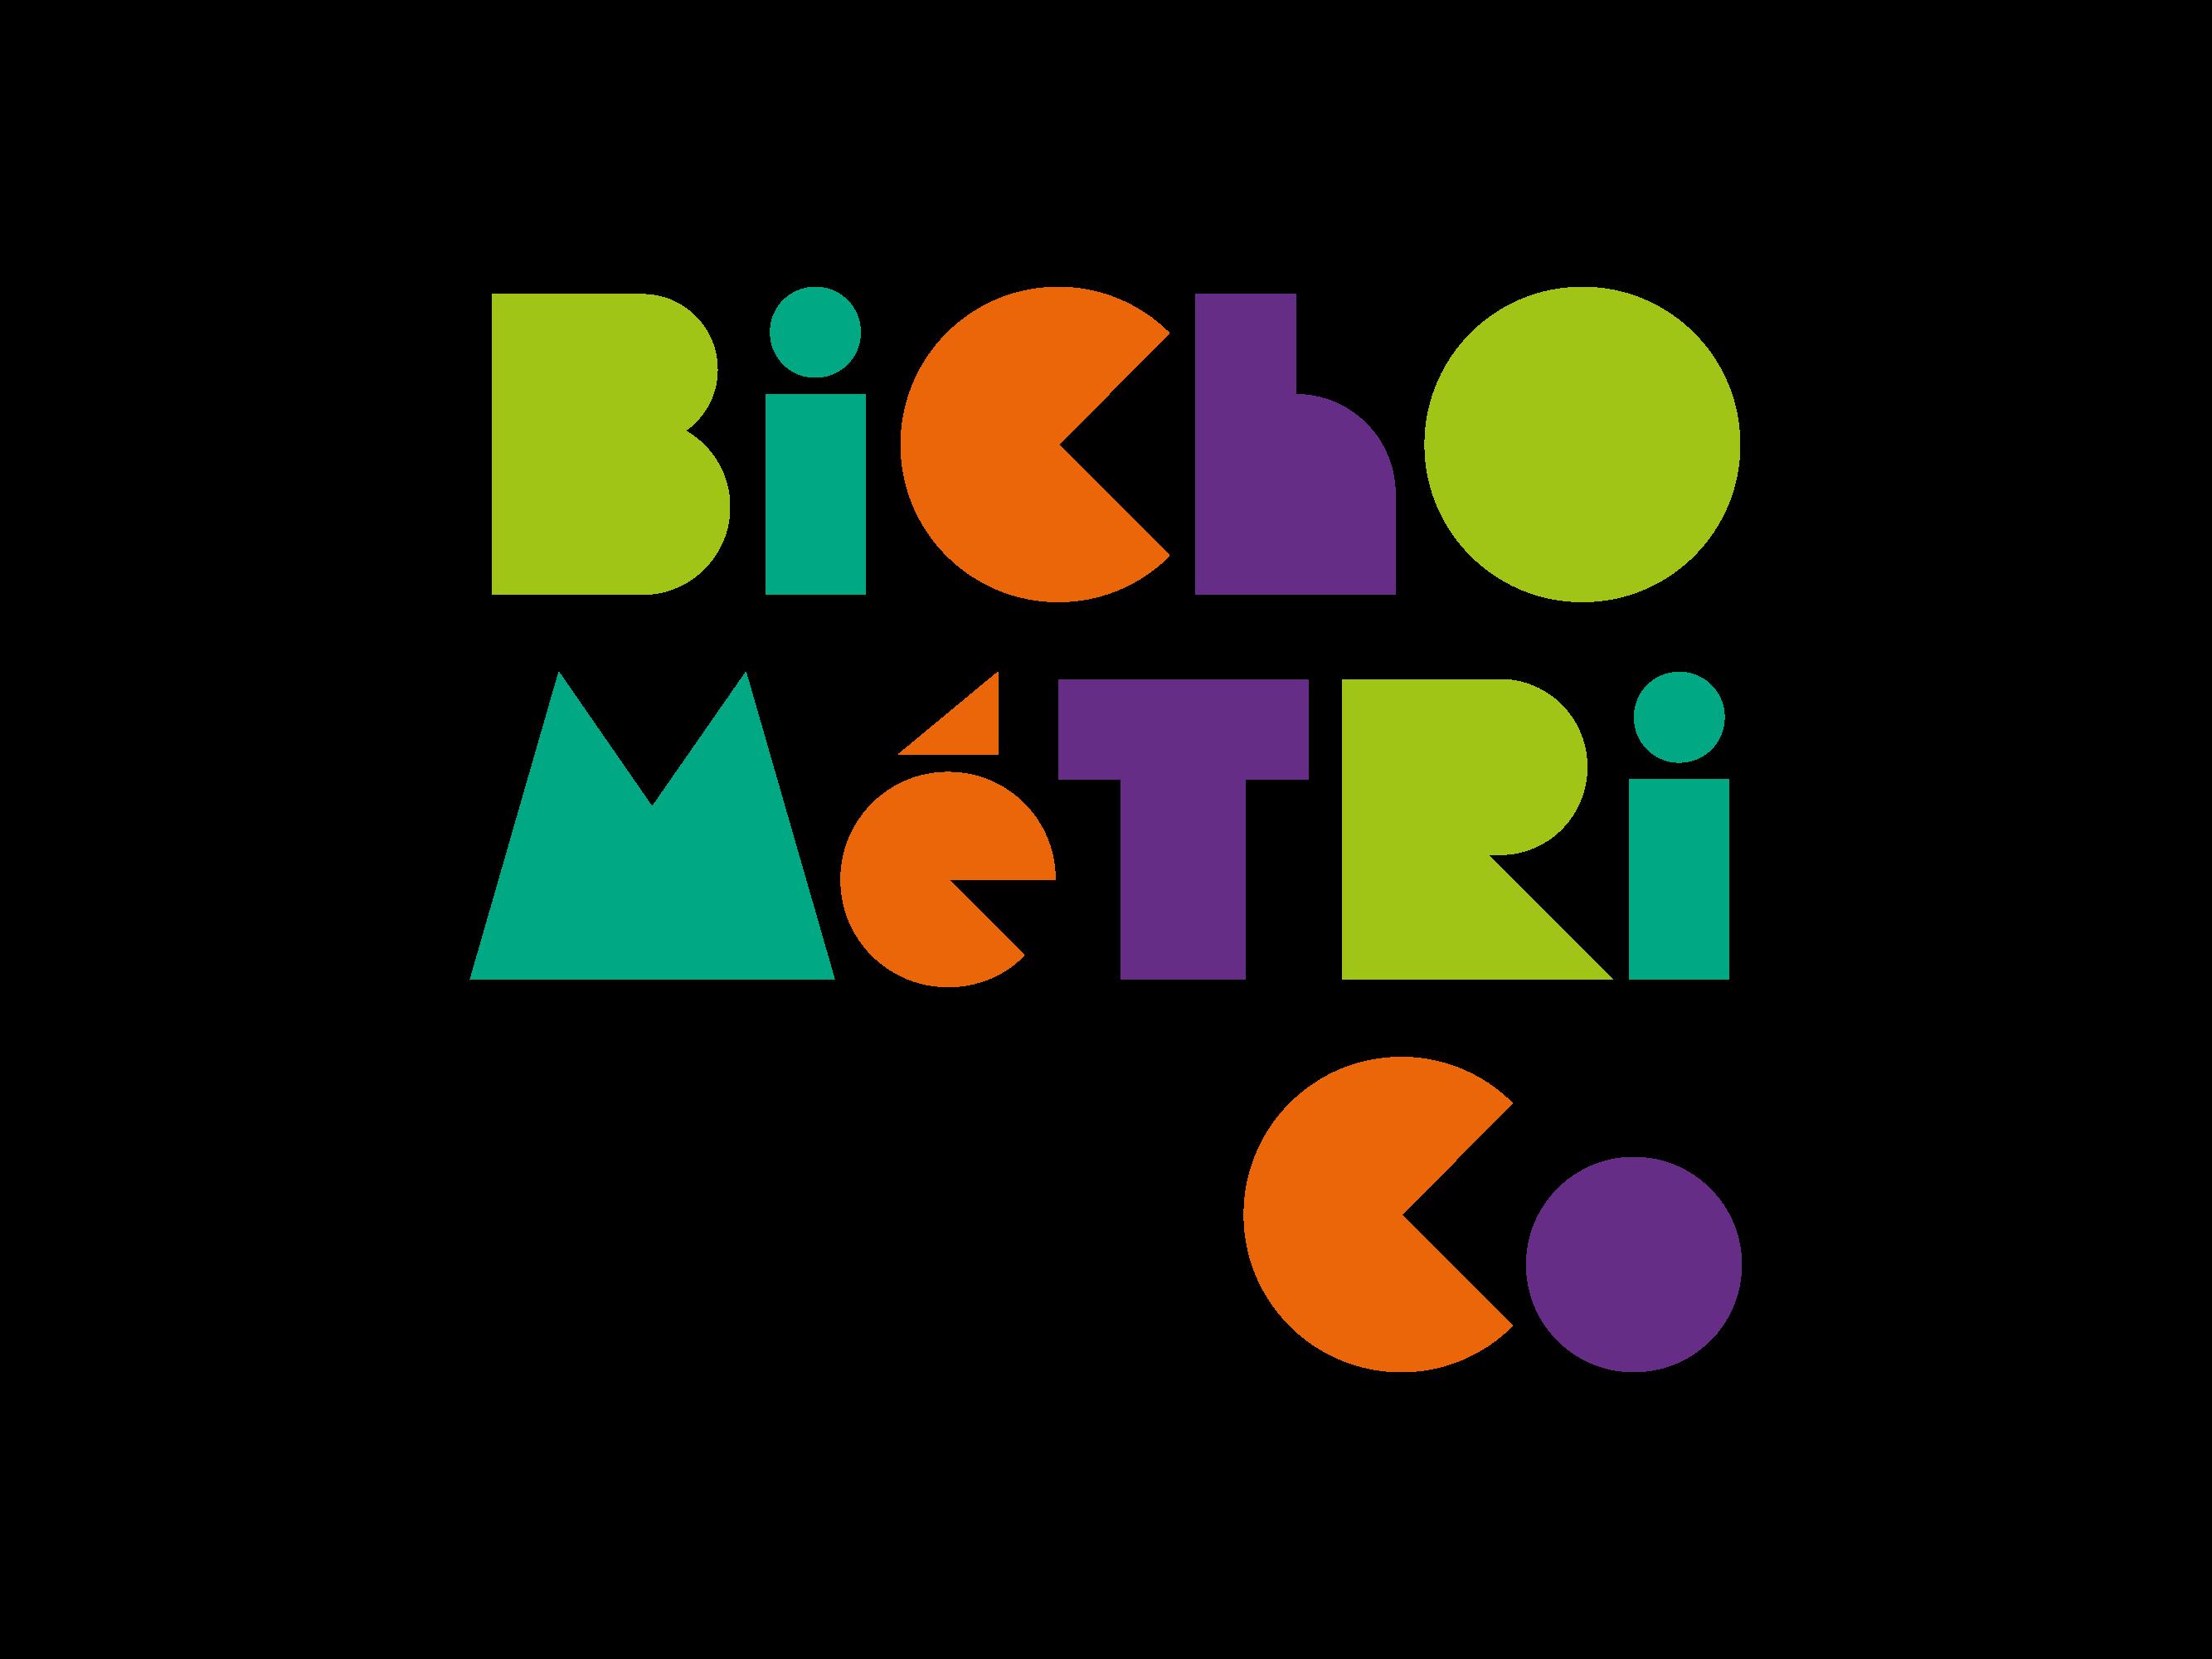 Bicho metrico